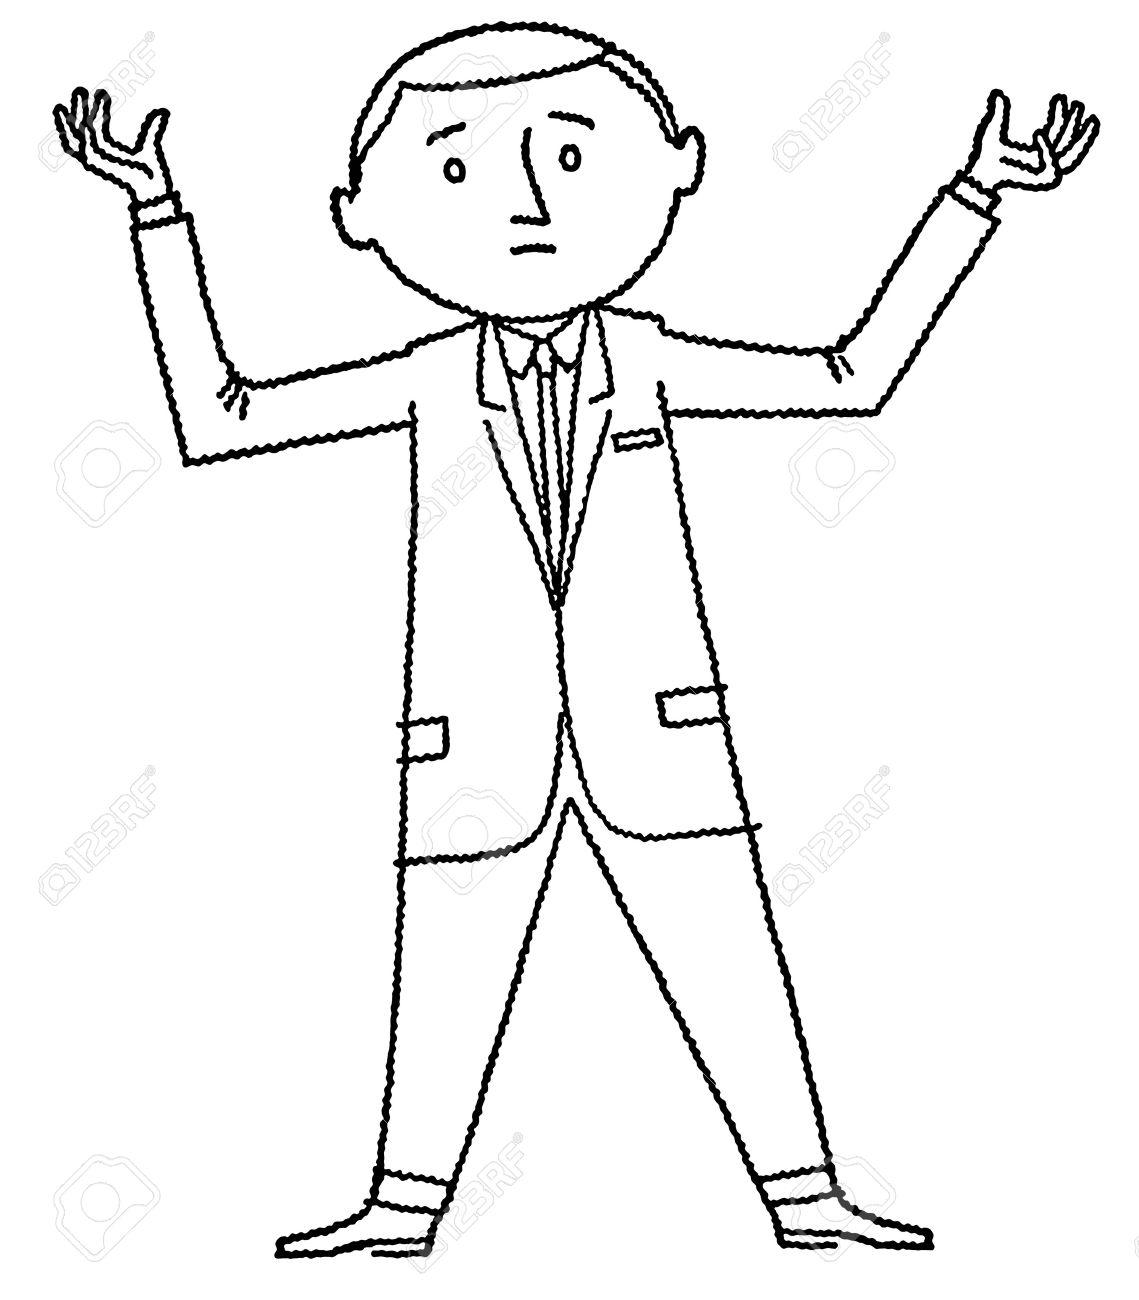 Cartoon Man Drawing